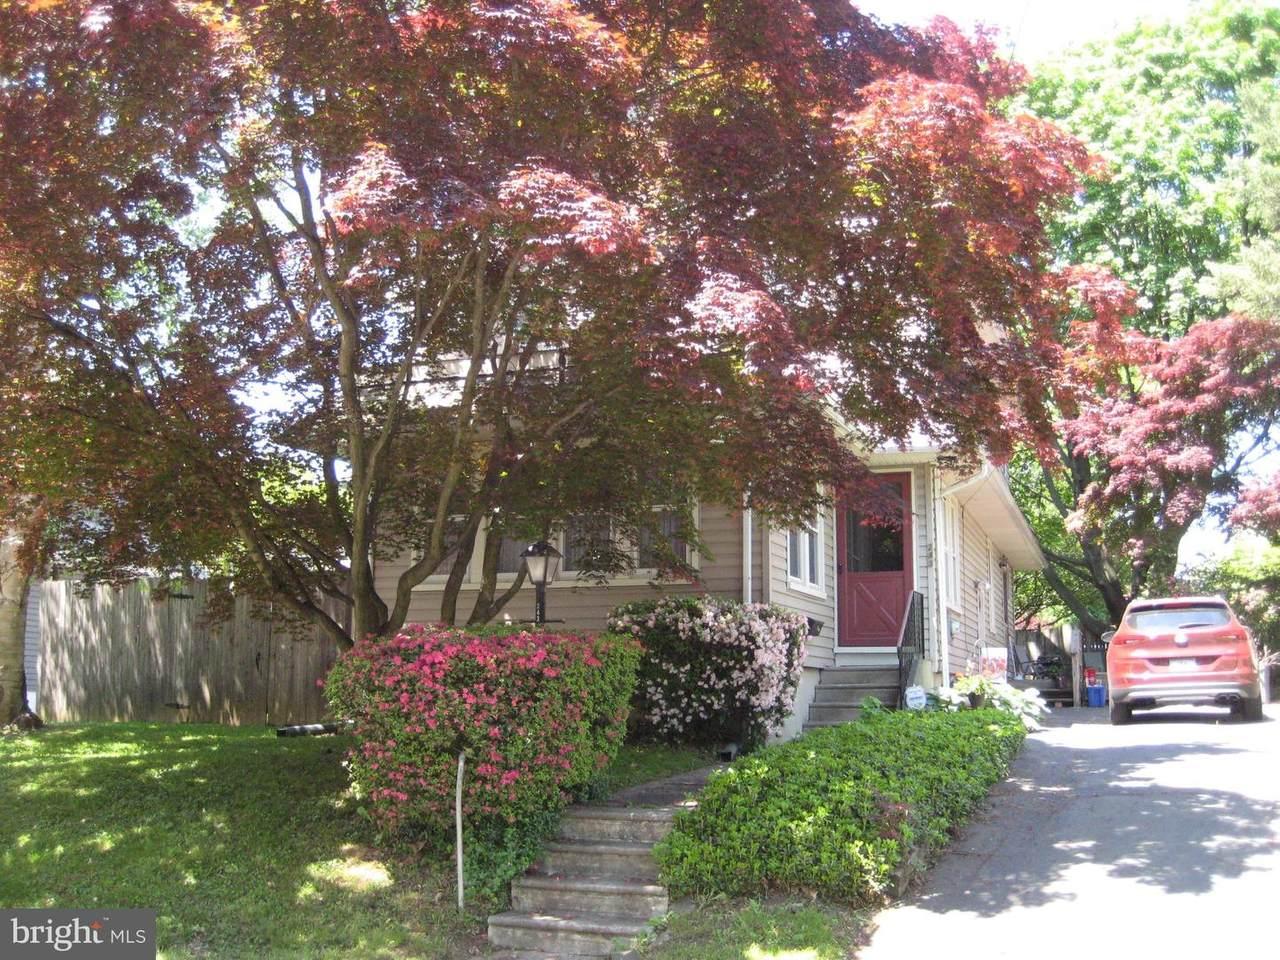 243 Ridley Avenue - Photo 1